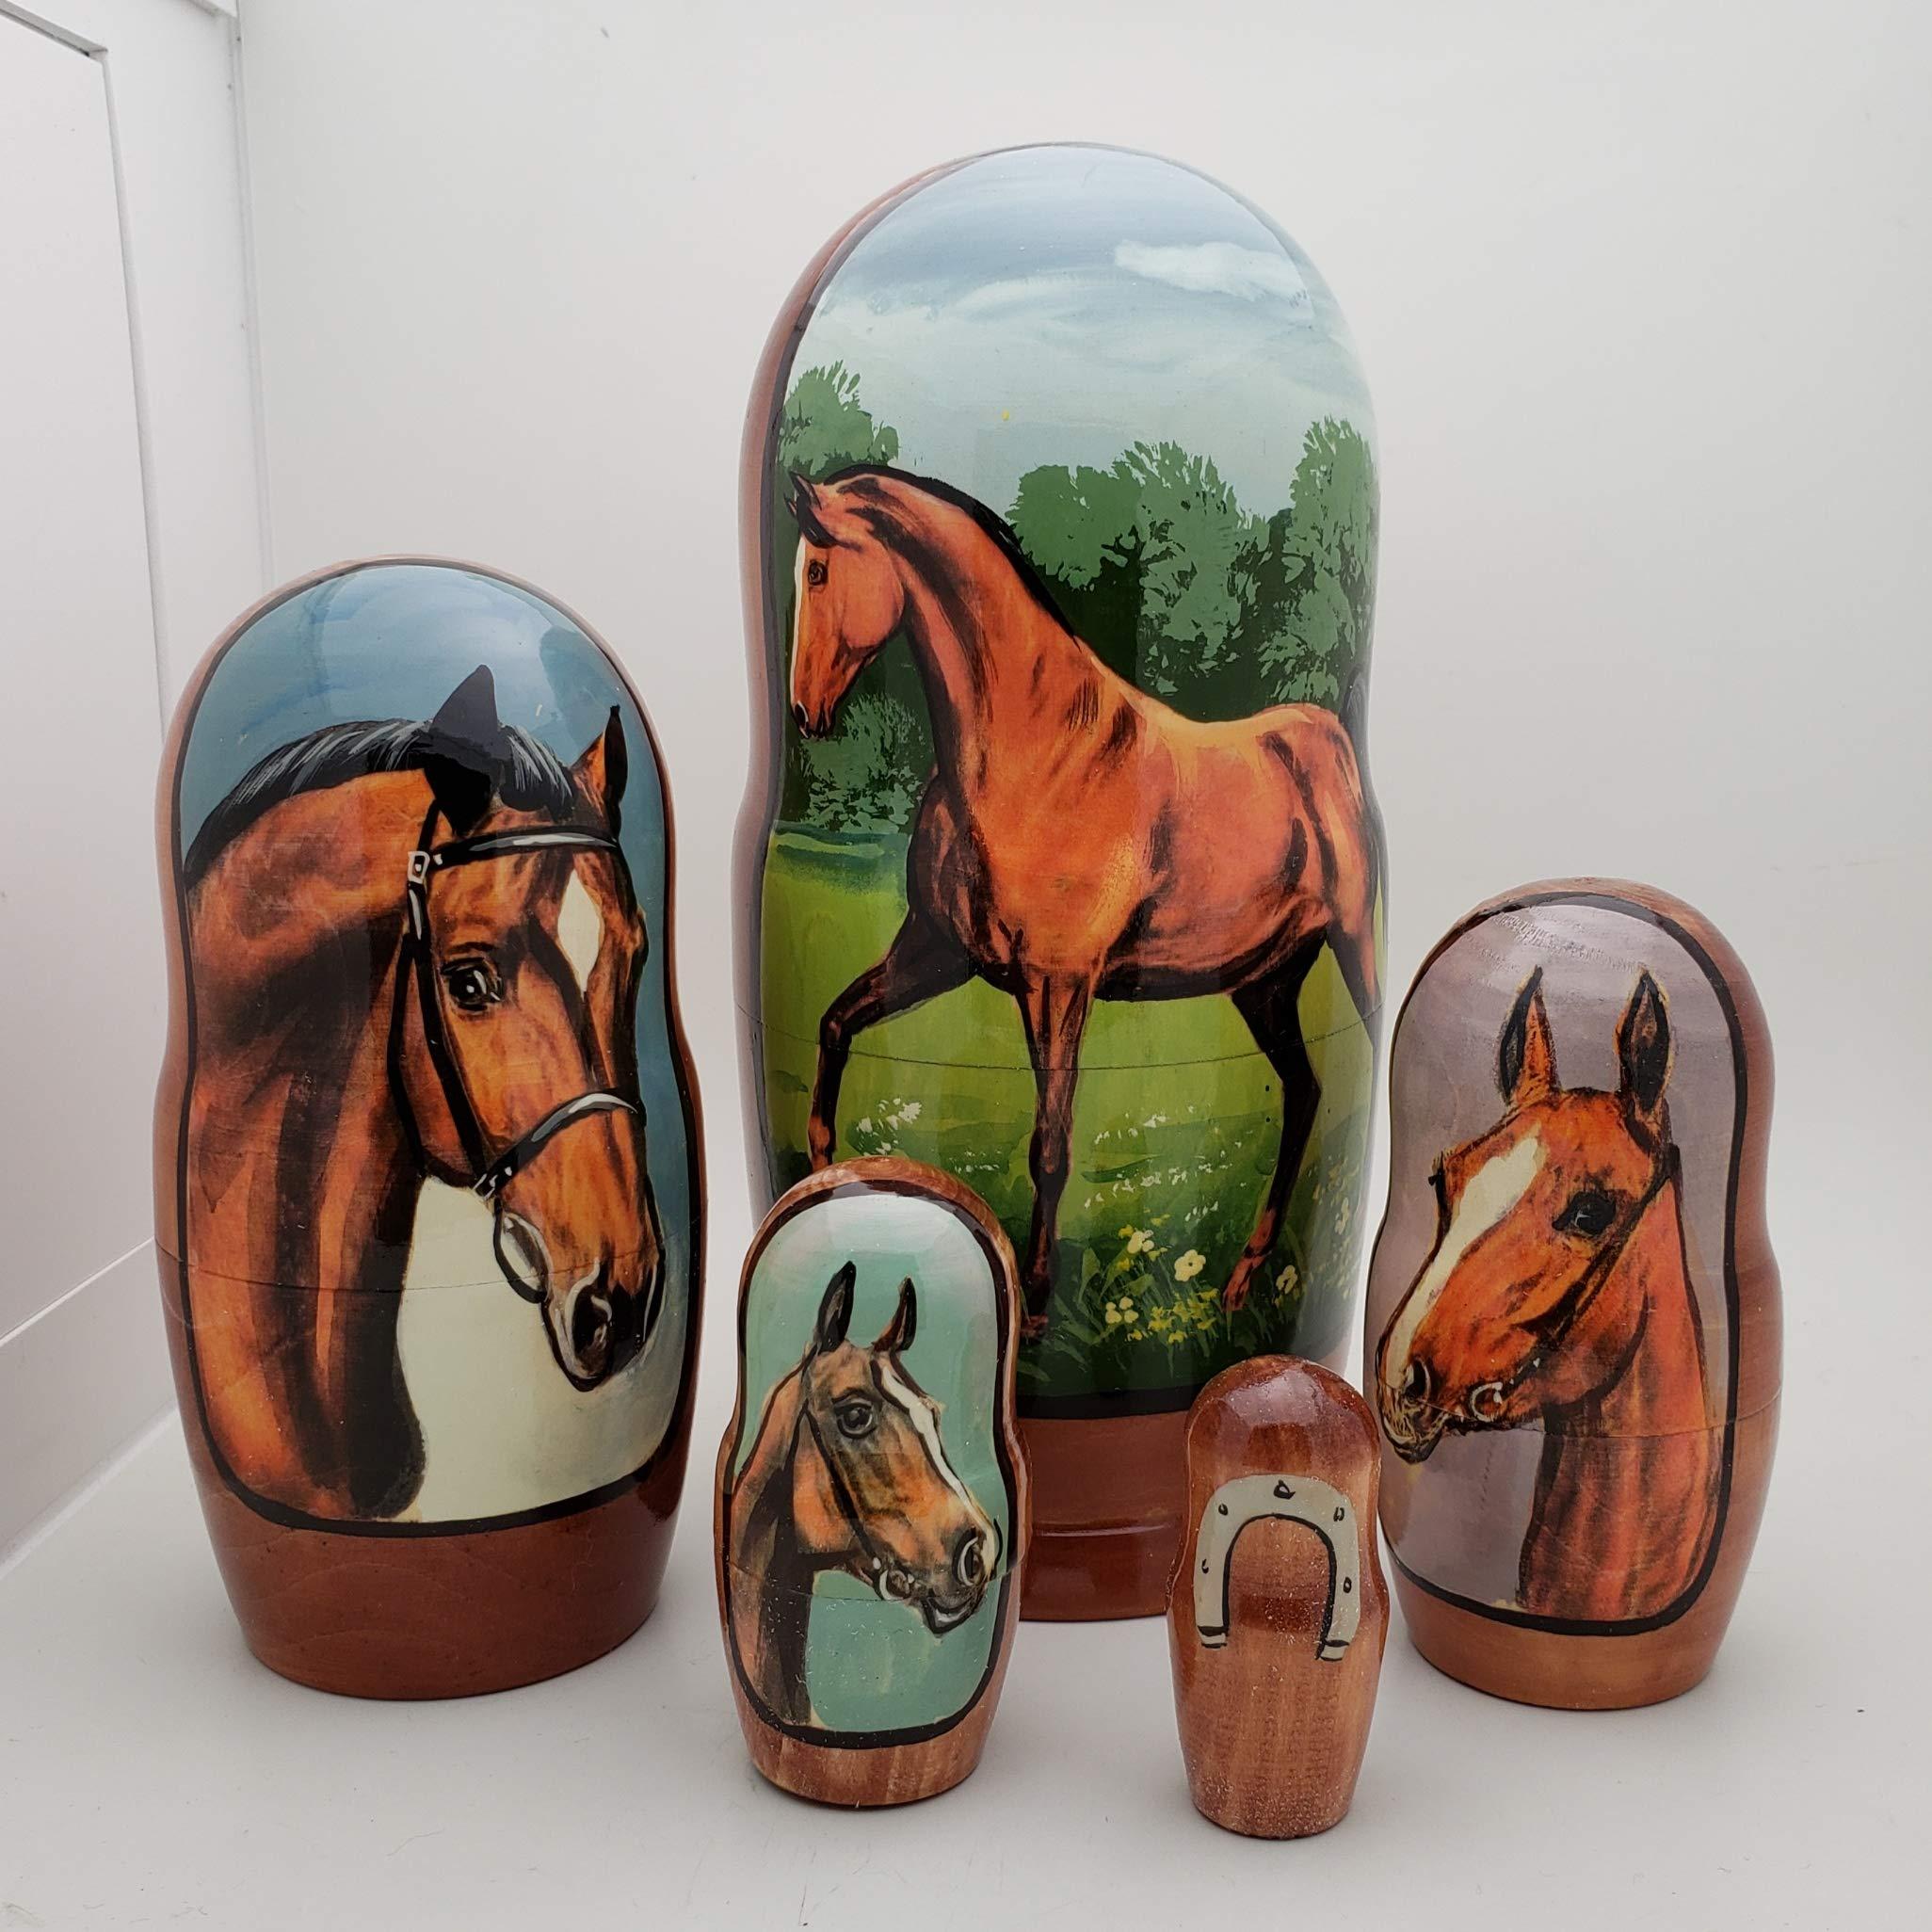 Horse Russian Nesting Dolls 5 Piece Set / 7'' H